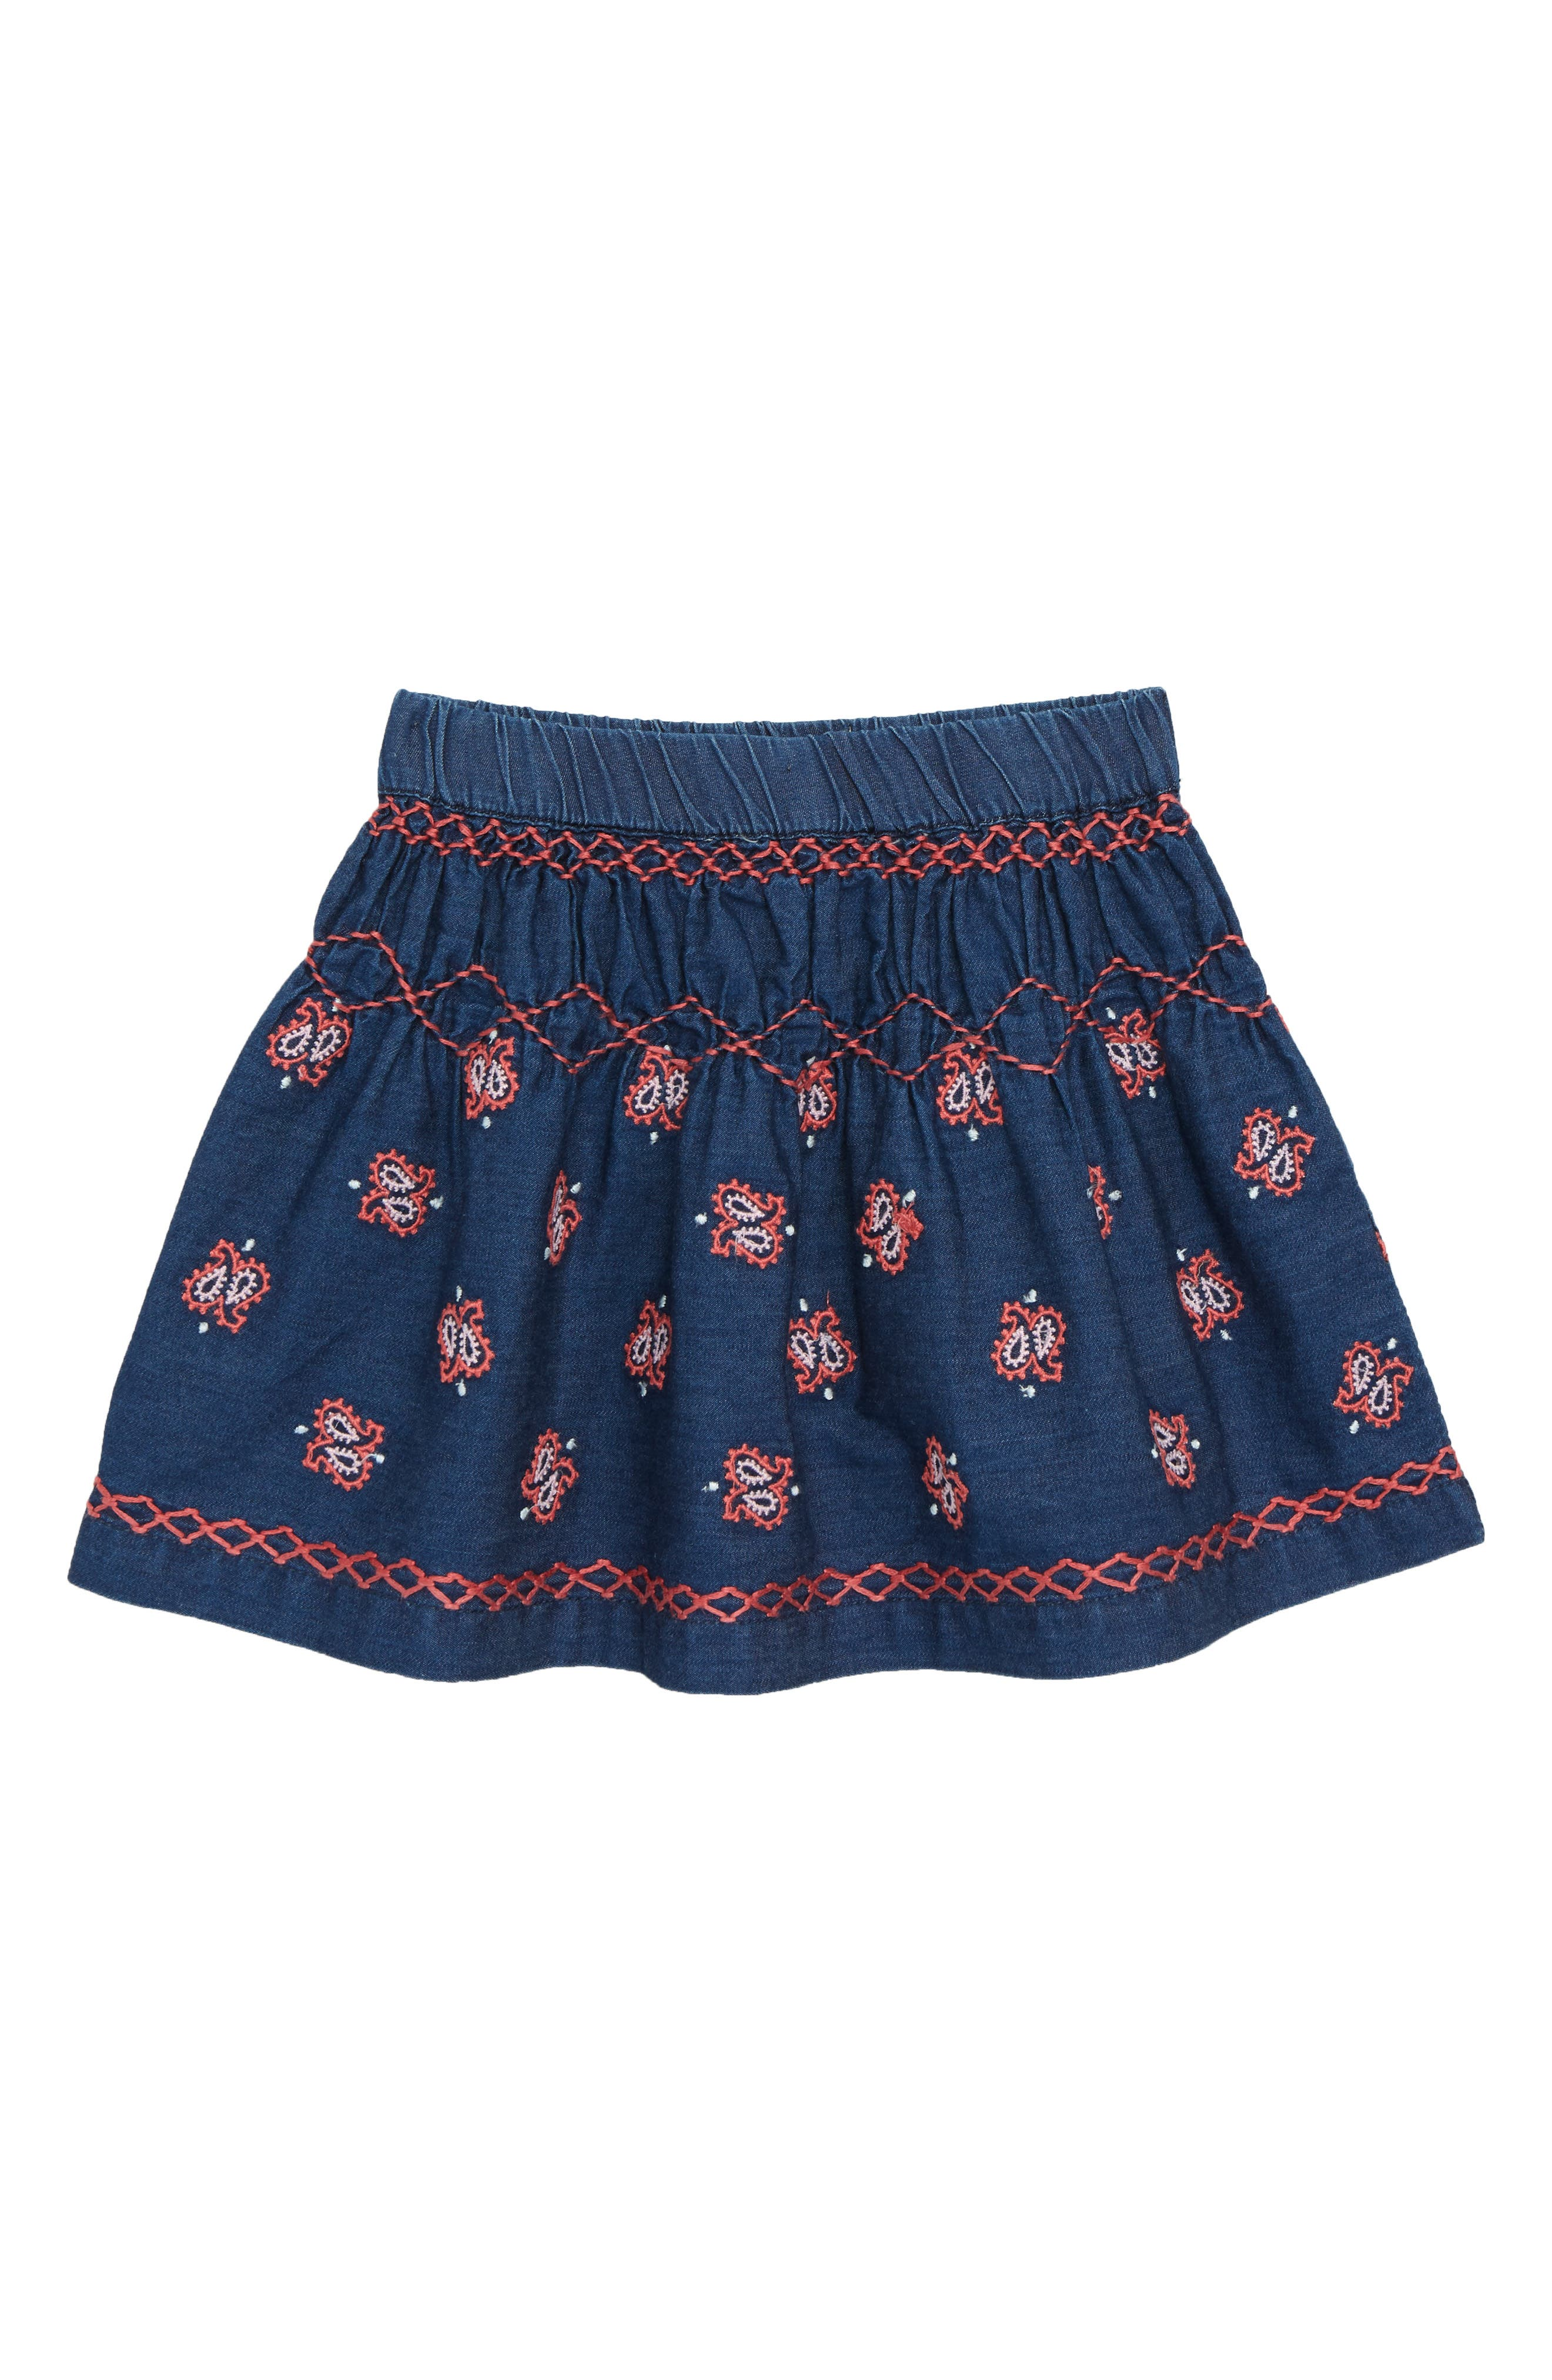 Peek Grace Embroidered Denim Skirt,                         Main,                         color, 402